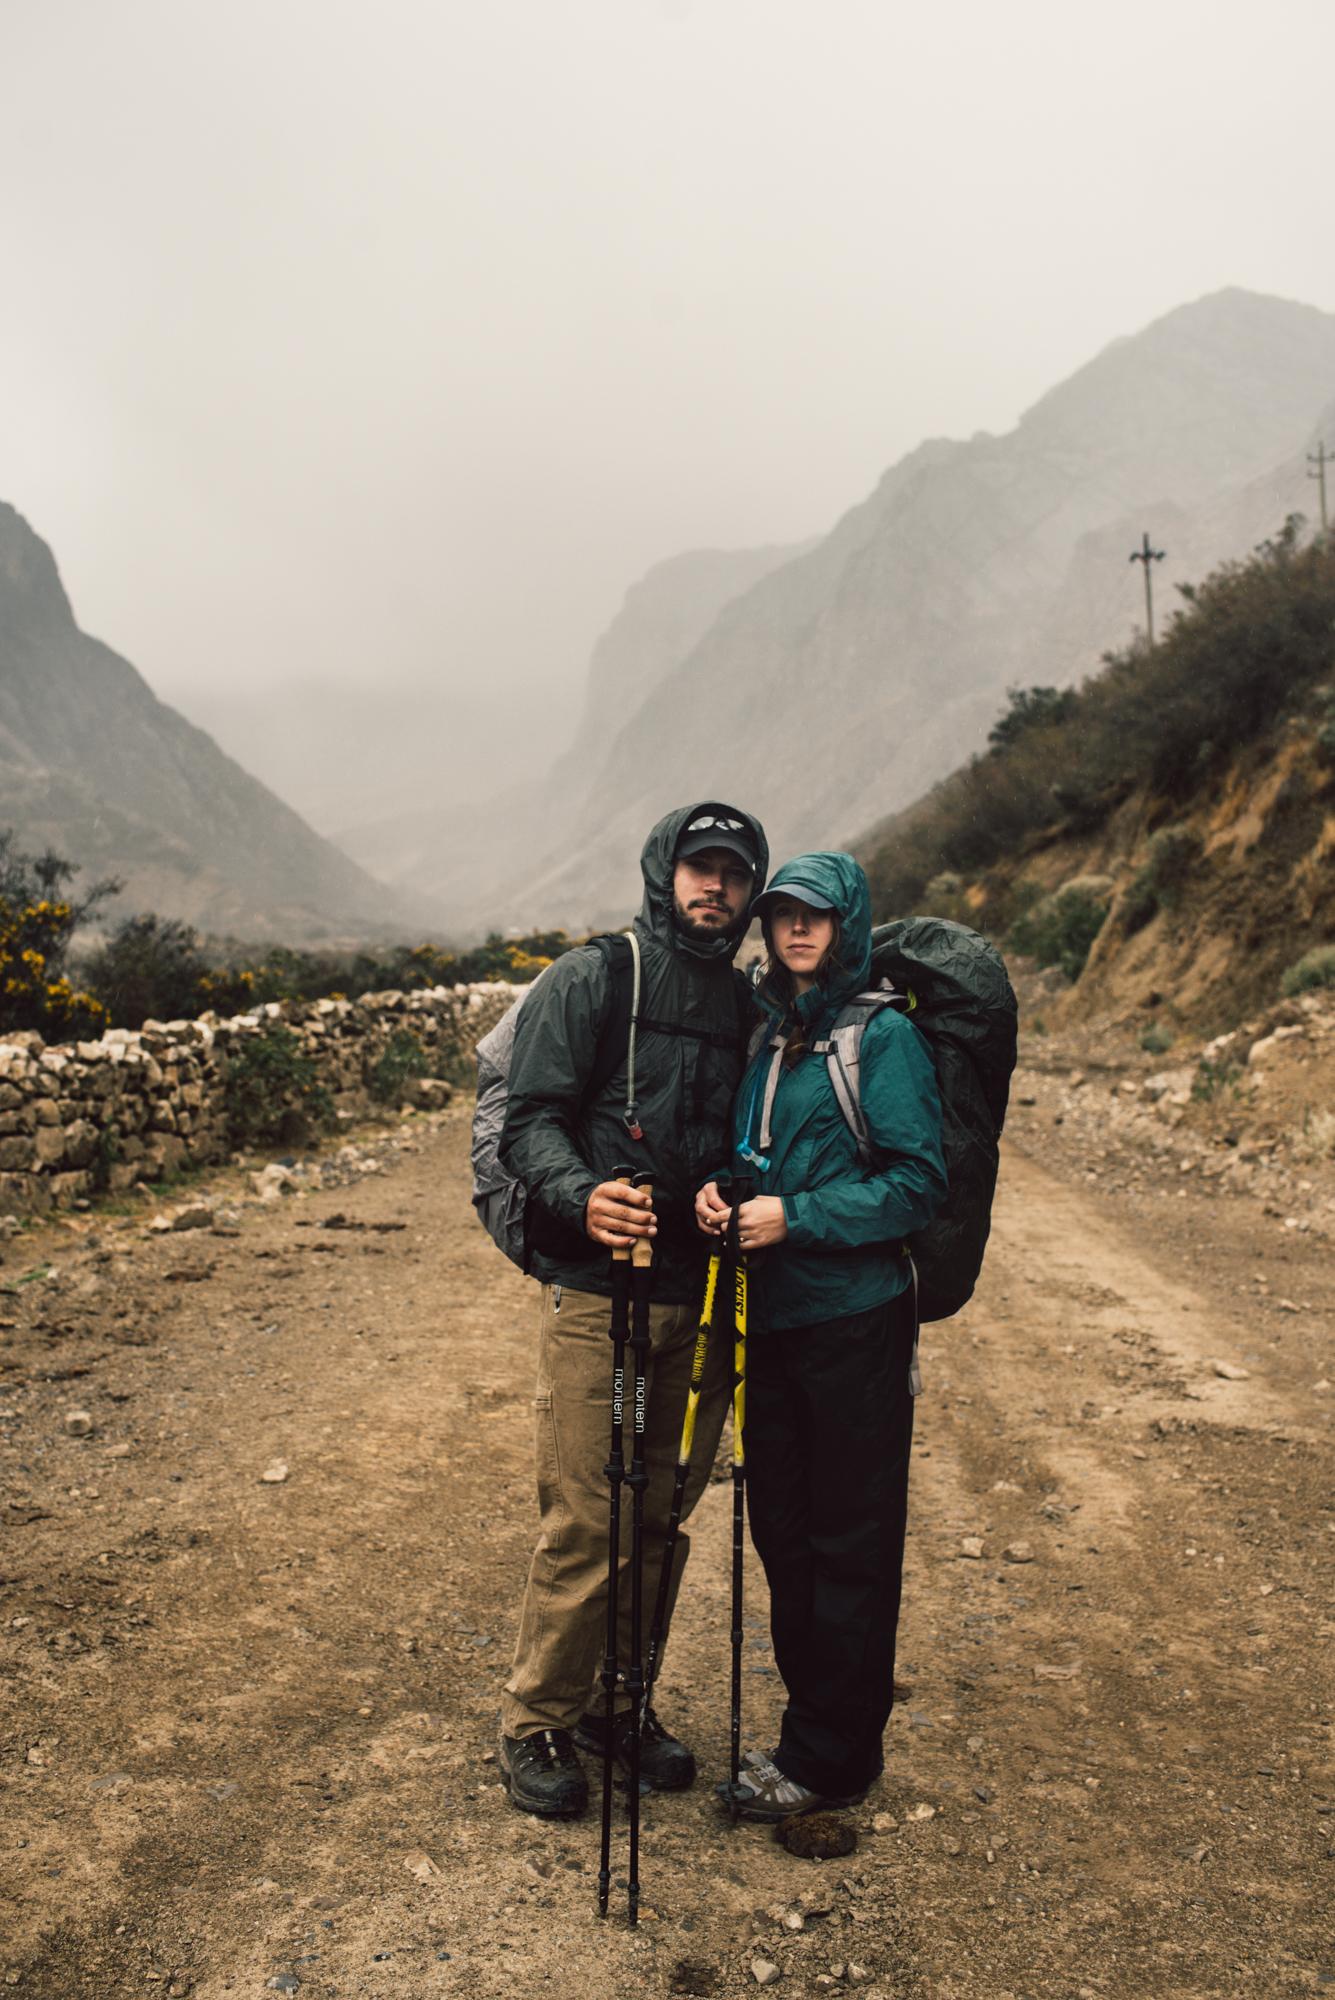 Damian and Jesse Engagement Session Huayhuash Mountain Trekking Peru_118.JPG